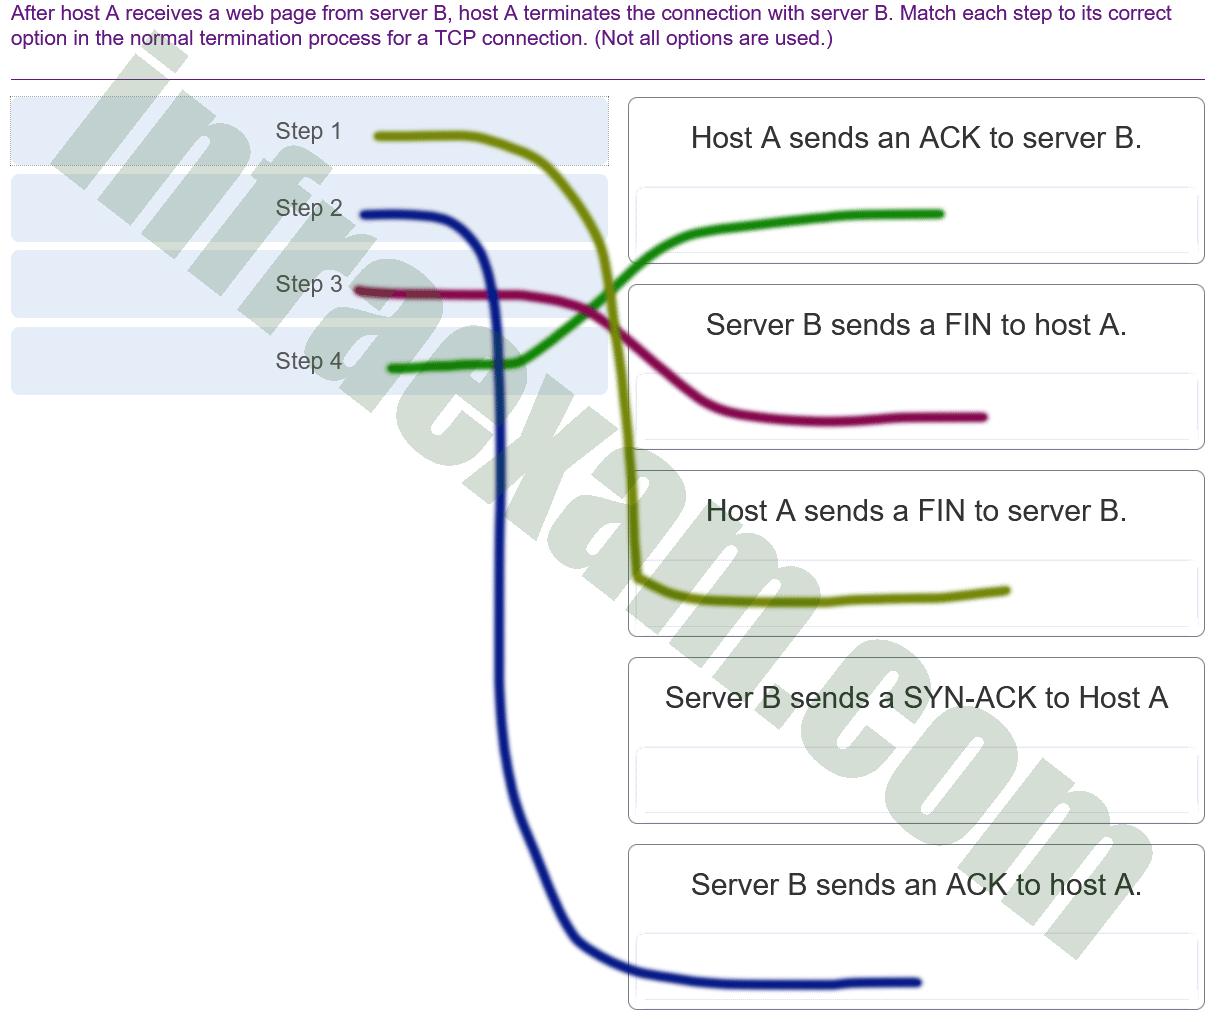 CyberOps Associate (Version 1.0) - CyberOps Associate 1.0 Final exam Answers 001